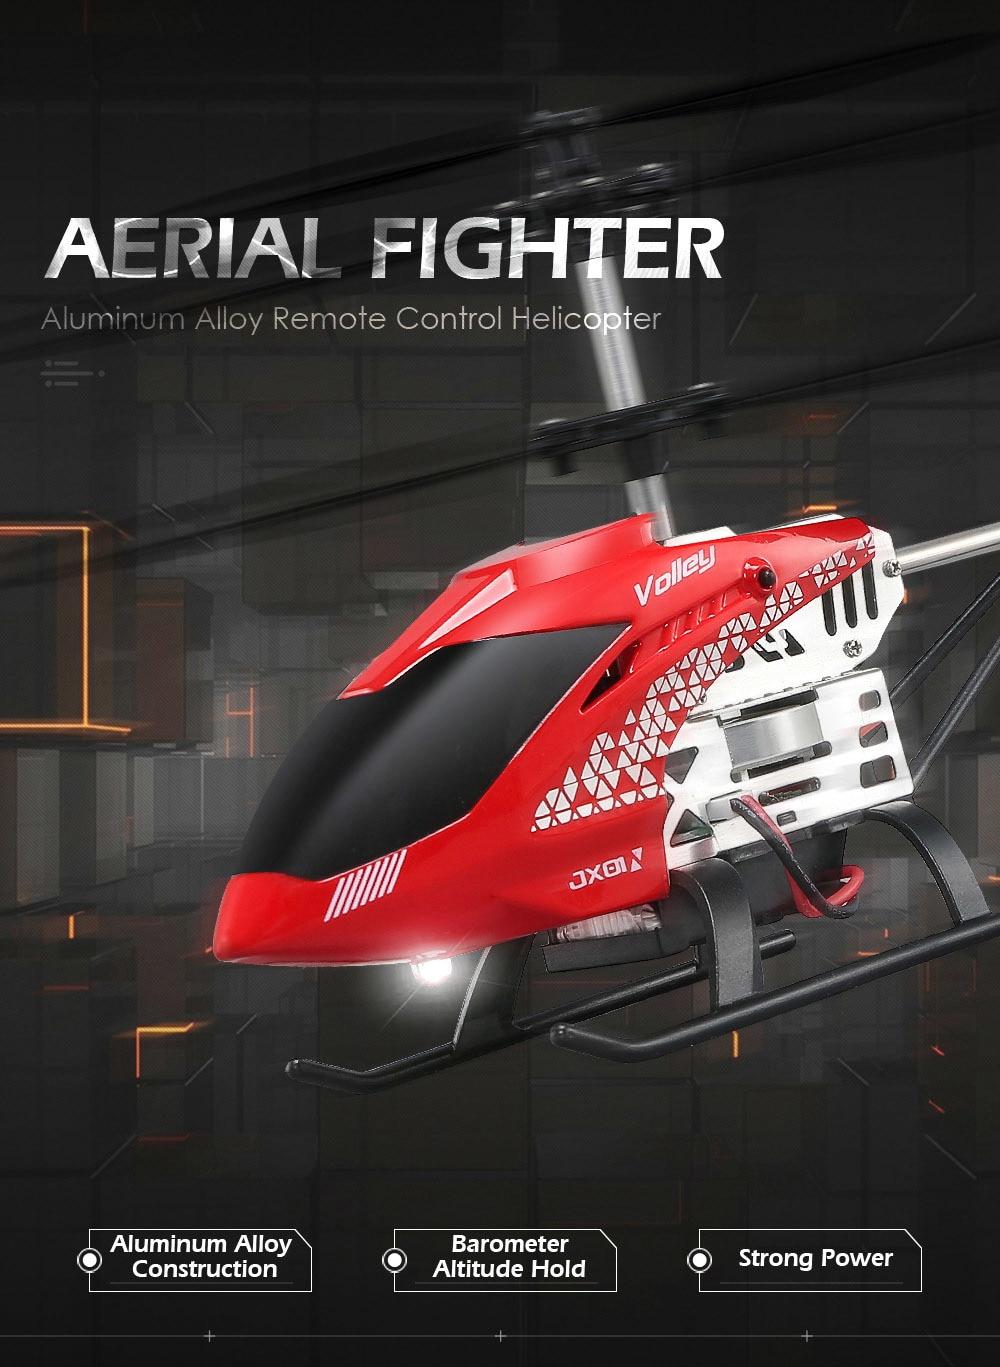 BTN Jx01 Rc ヘリコプターバロメーター高度ホールドと強力なパワーアルミ合金建設ラジオコントロール 1